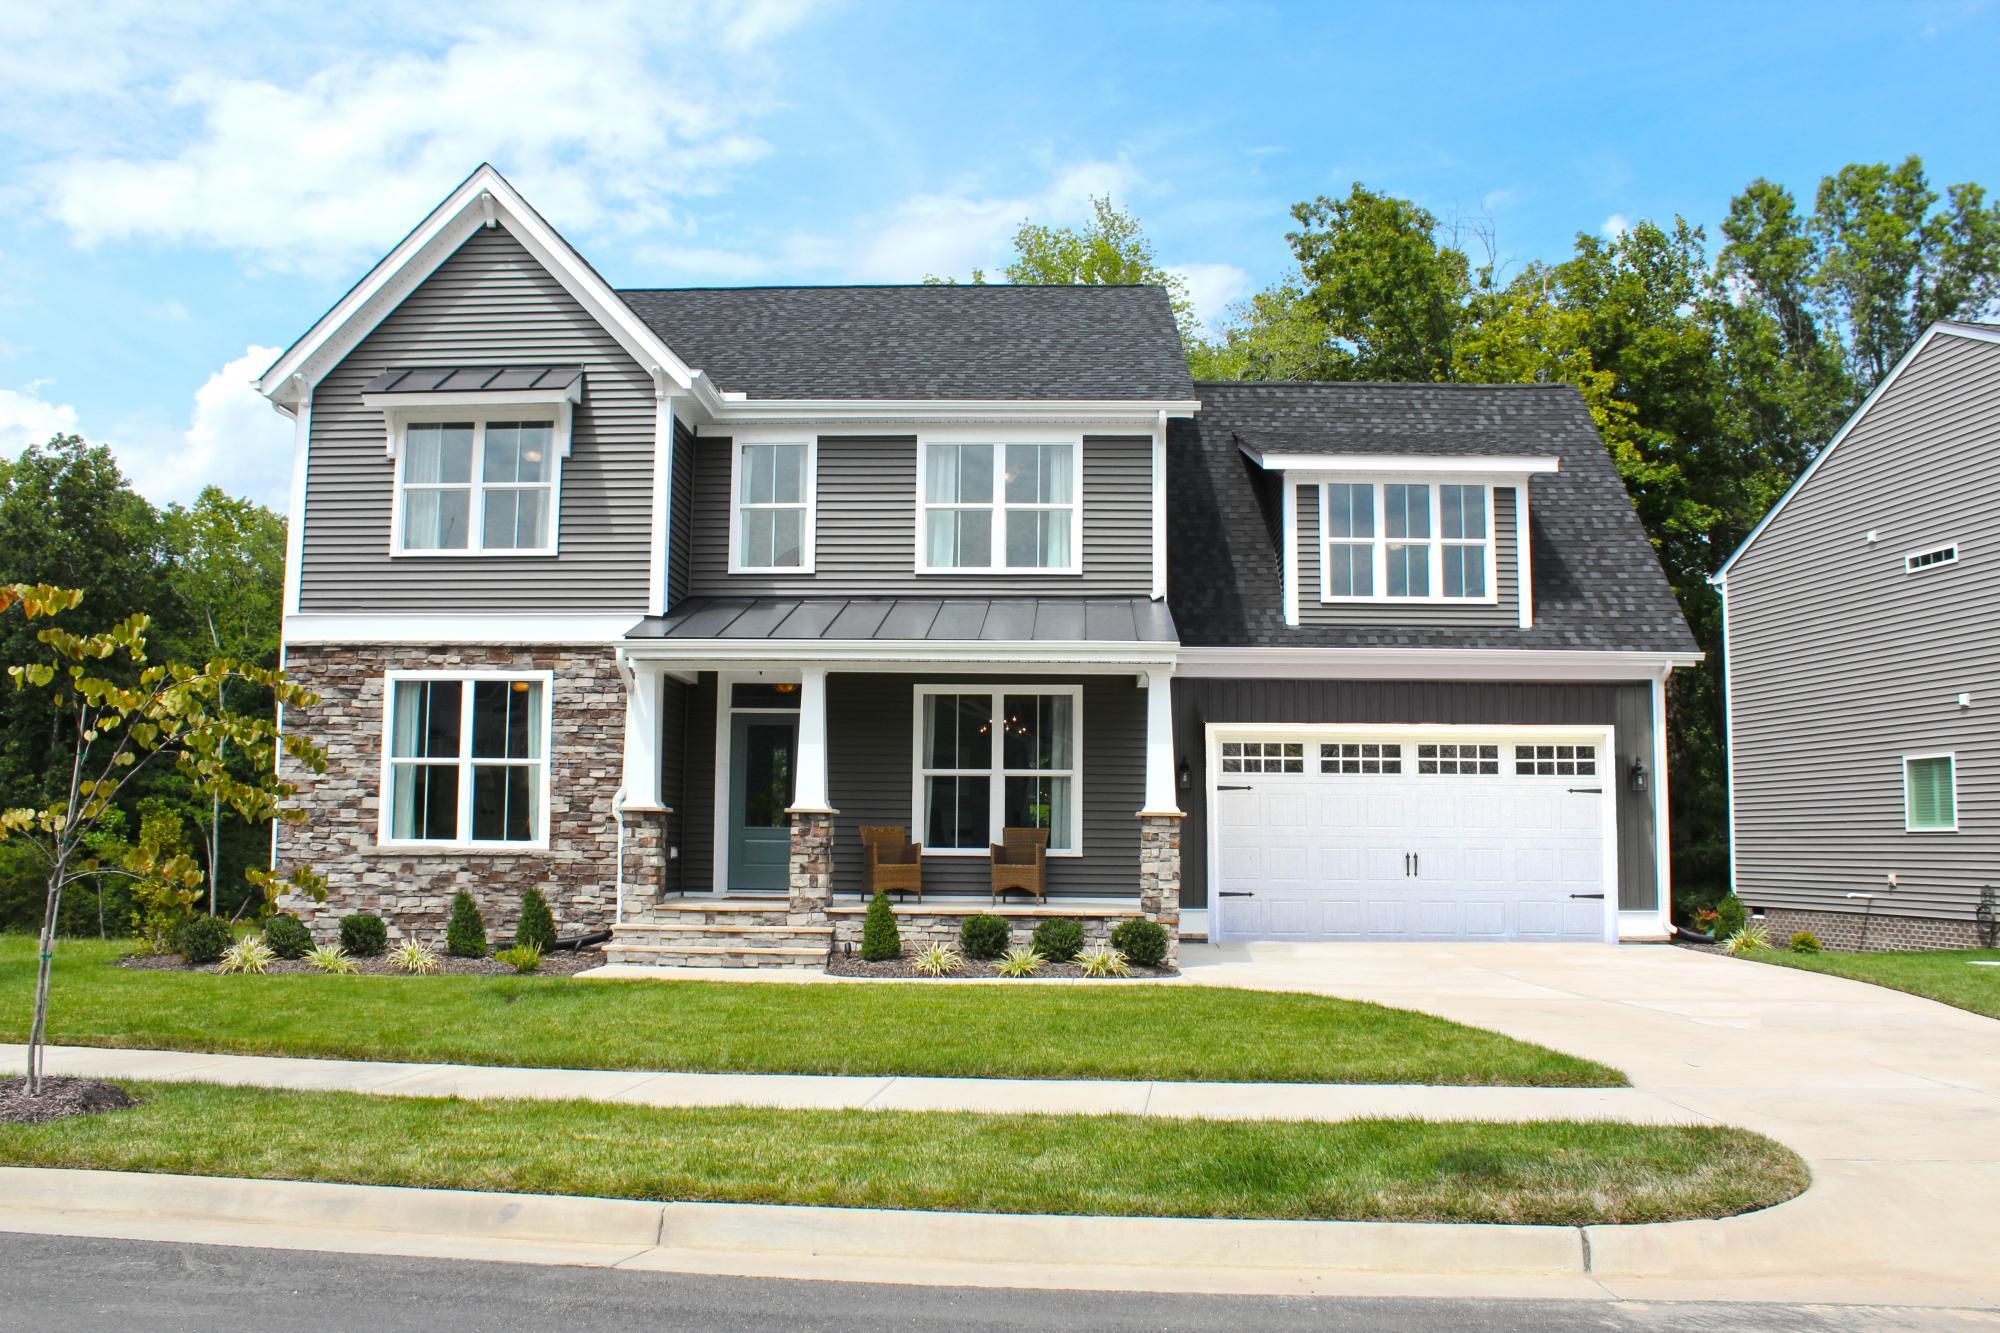 Build on your lot new homes richmond va main street homes 10 photos solutioingenieria Images